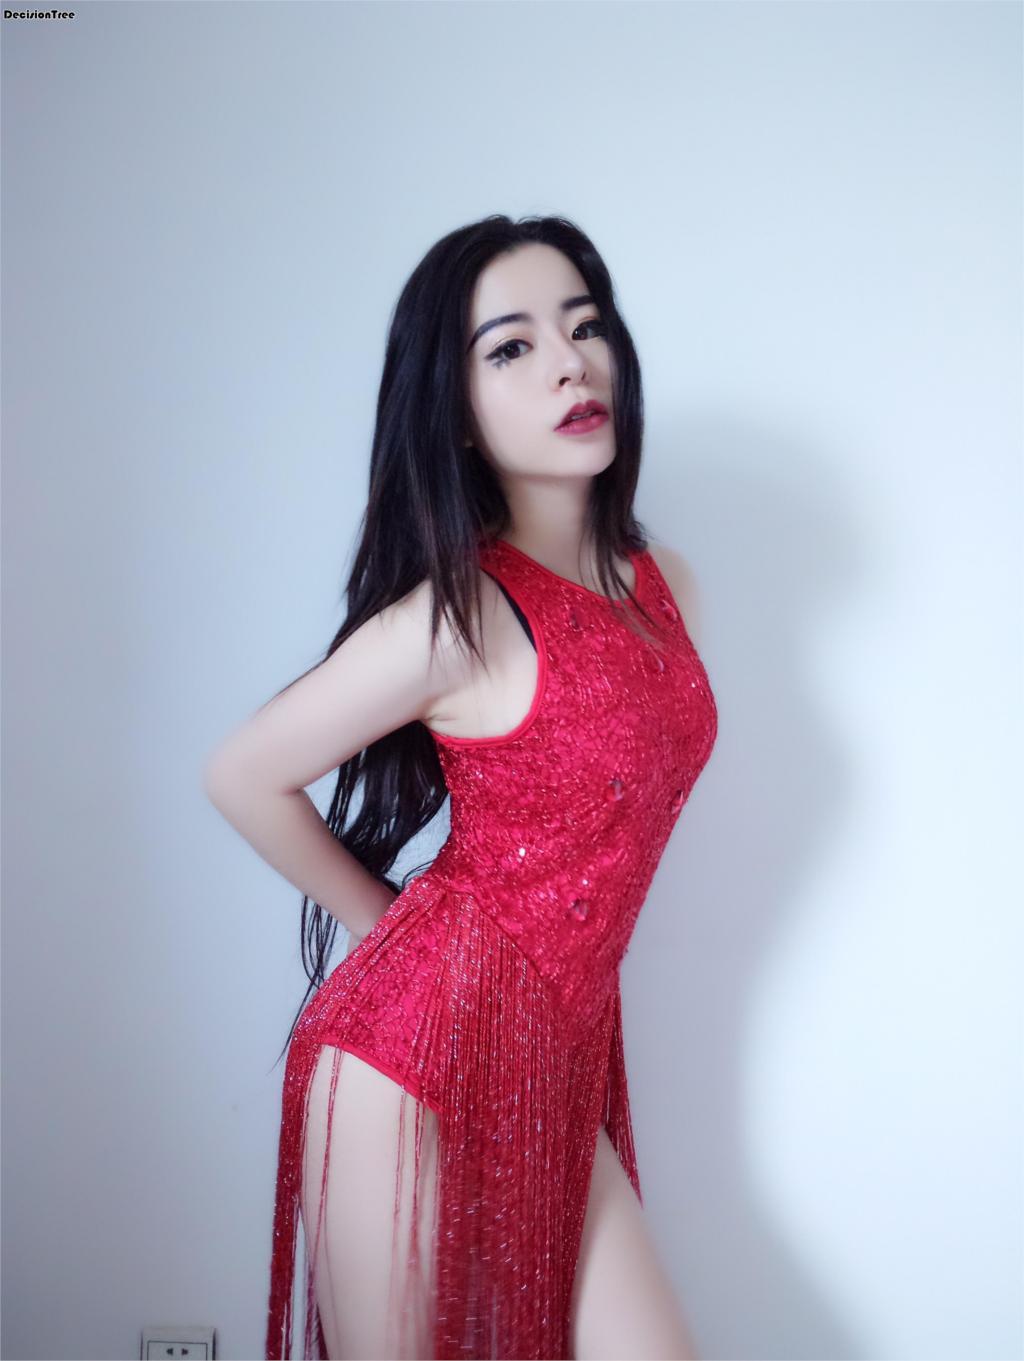 2020 Female Sexy Ds Dj Costumes Lead Dancer Nightclub Singer Clothing Jazz Performance Dance Costume Sexy Tassel Sparkling Dress